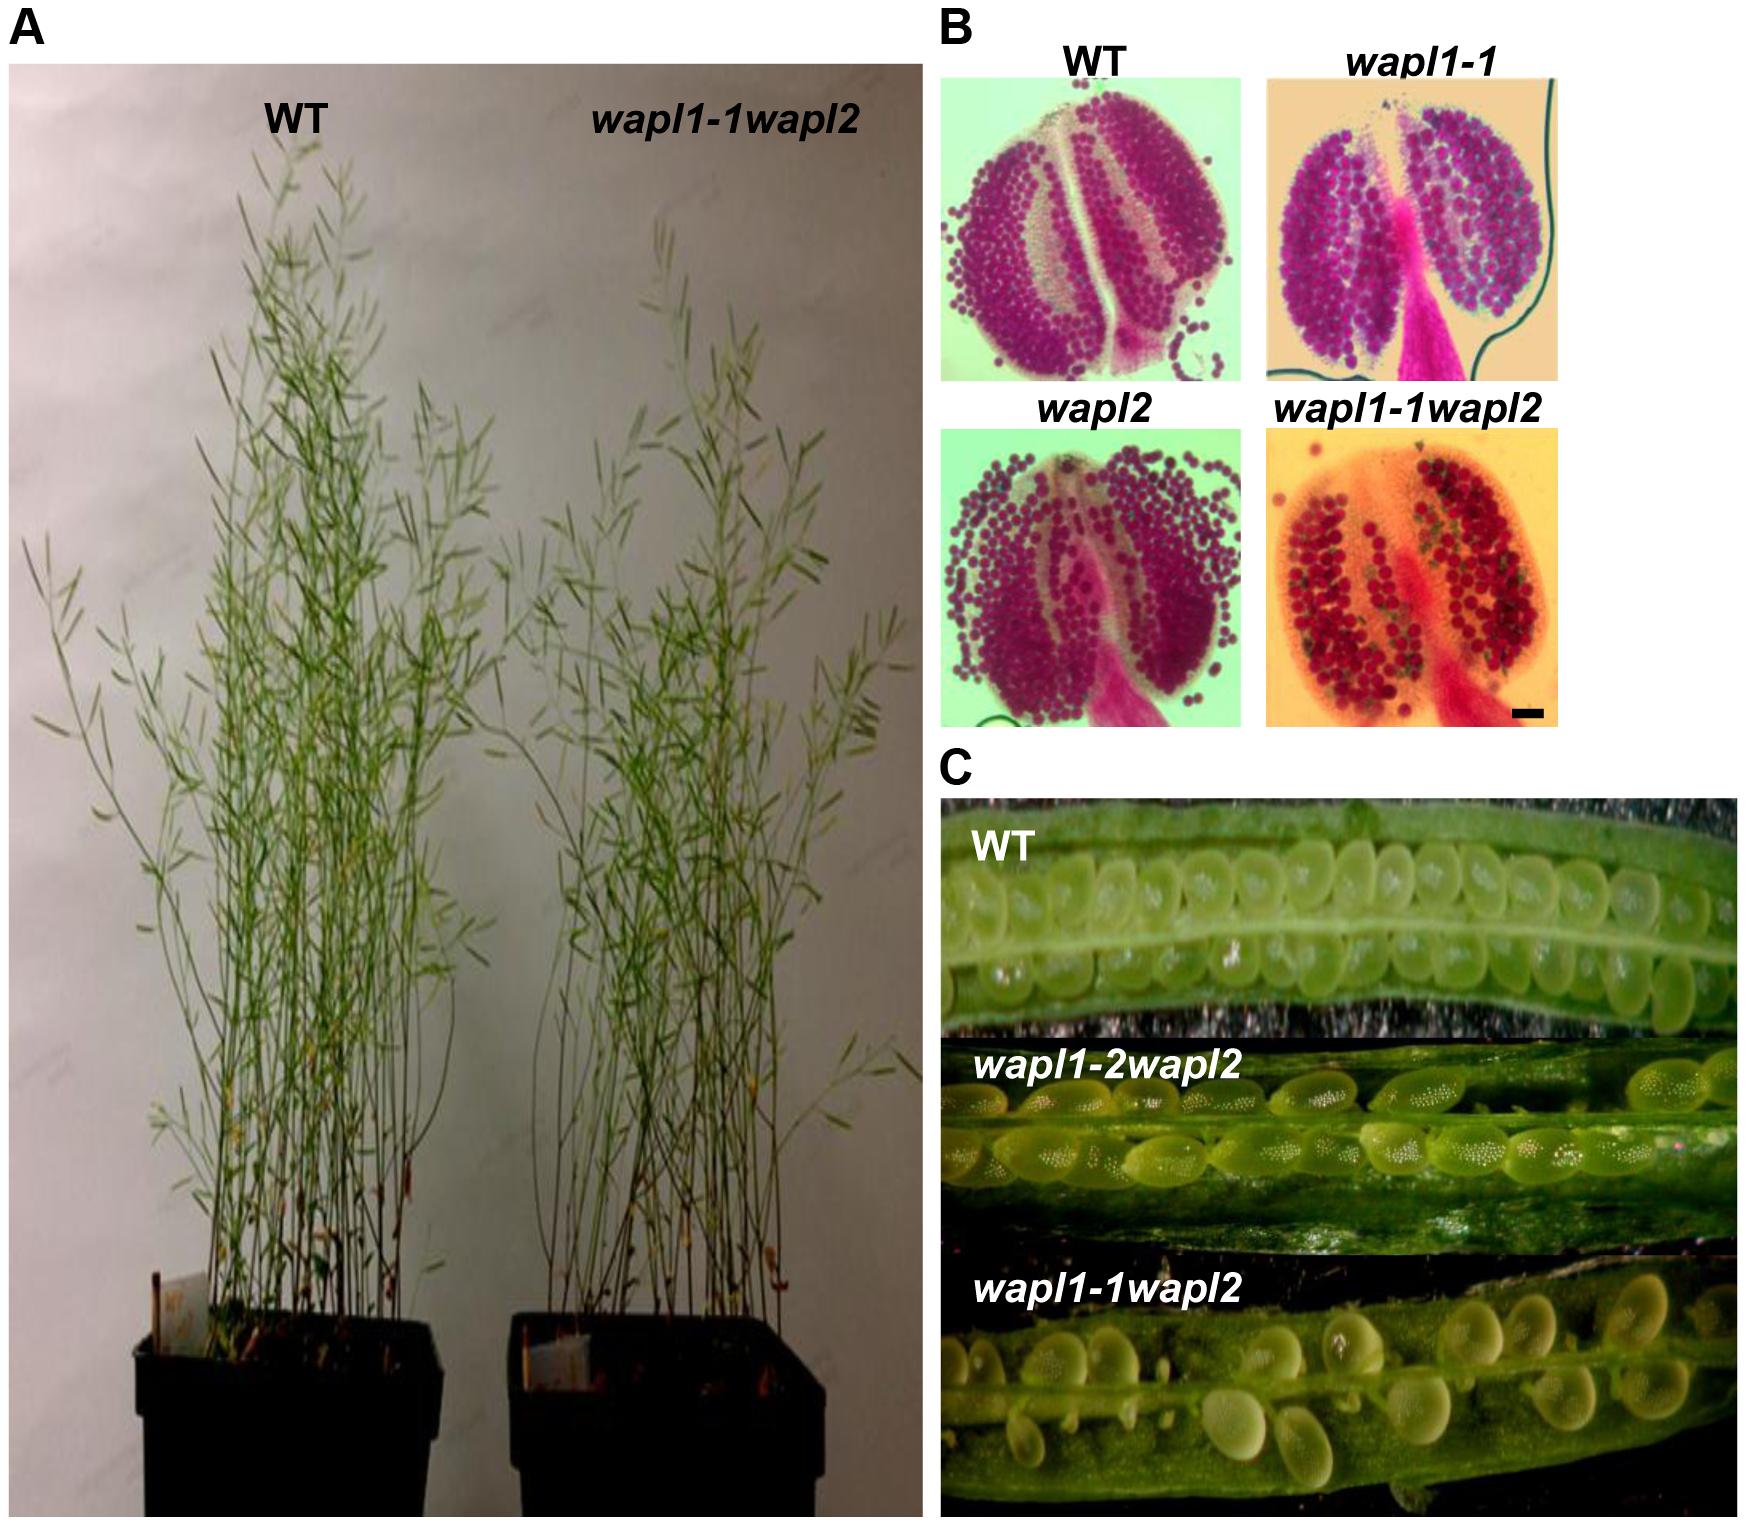 <i>Atwapl1-1wapl2</i> plants exhibit reduced fertility.